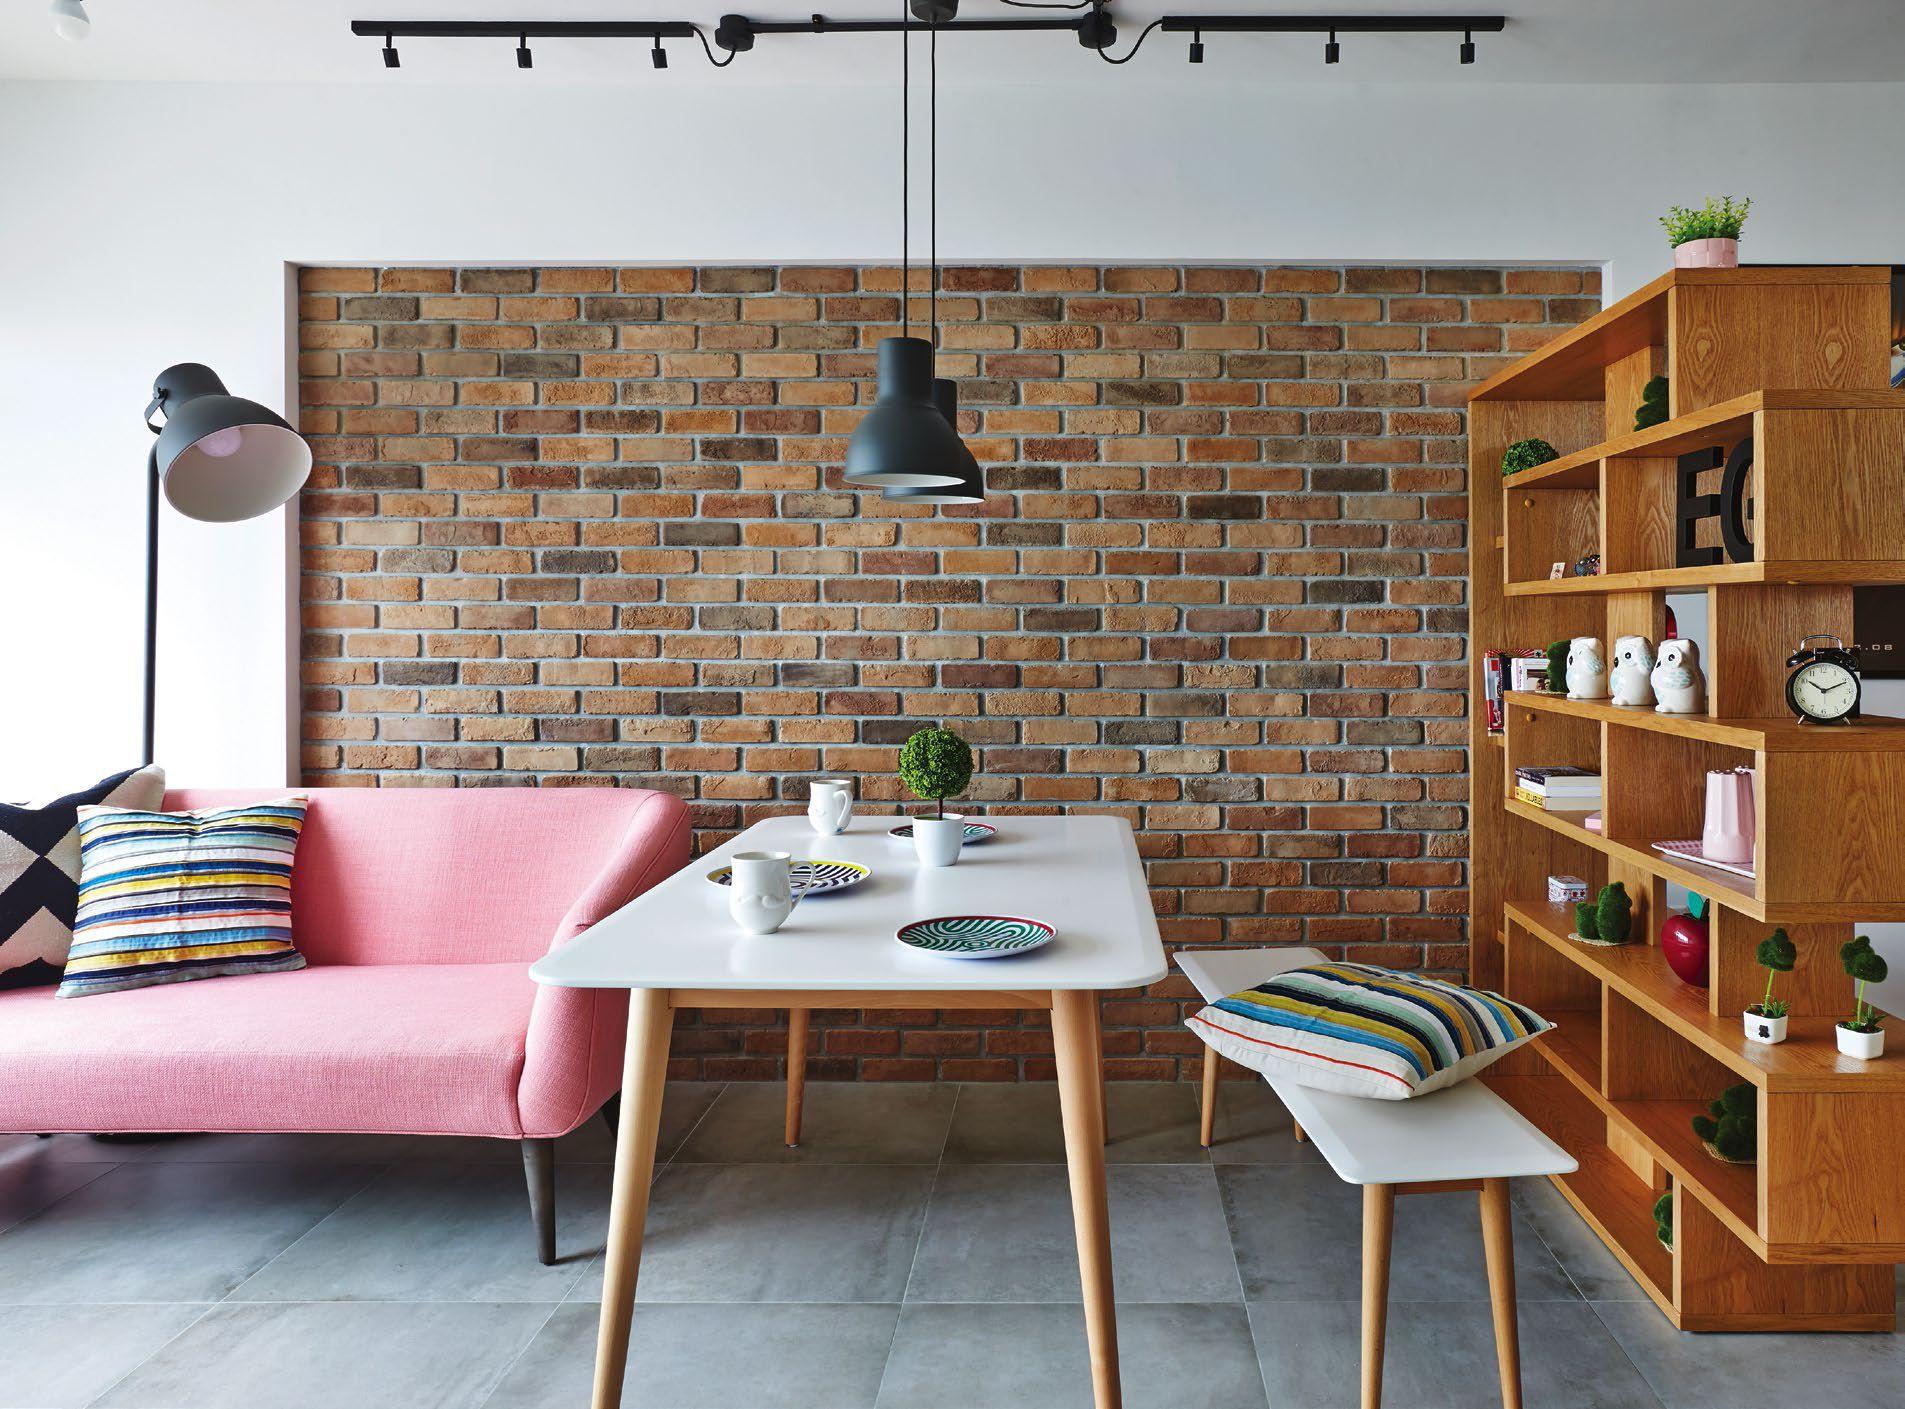 A Scandinavian Cross Industrial Theme Living Dining Area Egapartment Hdb Bto 4room Livingroom Din Industrial Home Design Home Interior Design Interior